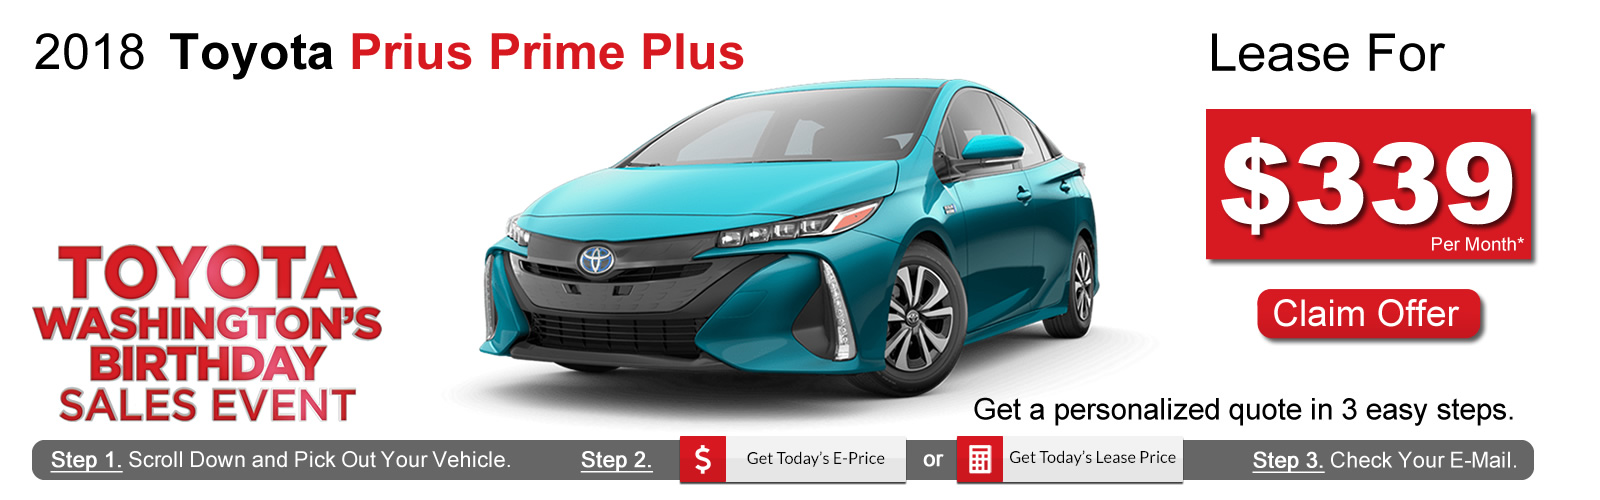 2019 Toyota Prius Lease Deals near Boston, MA